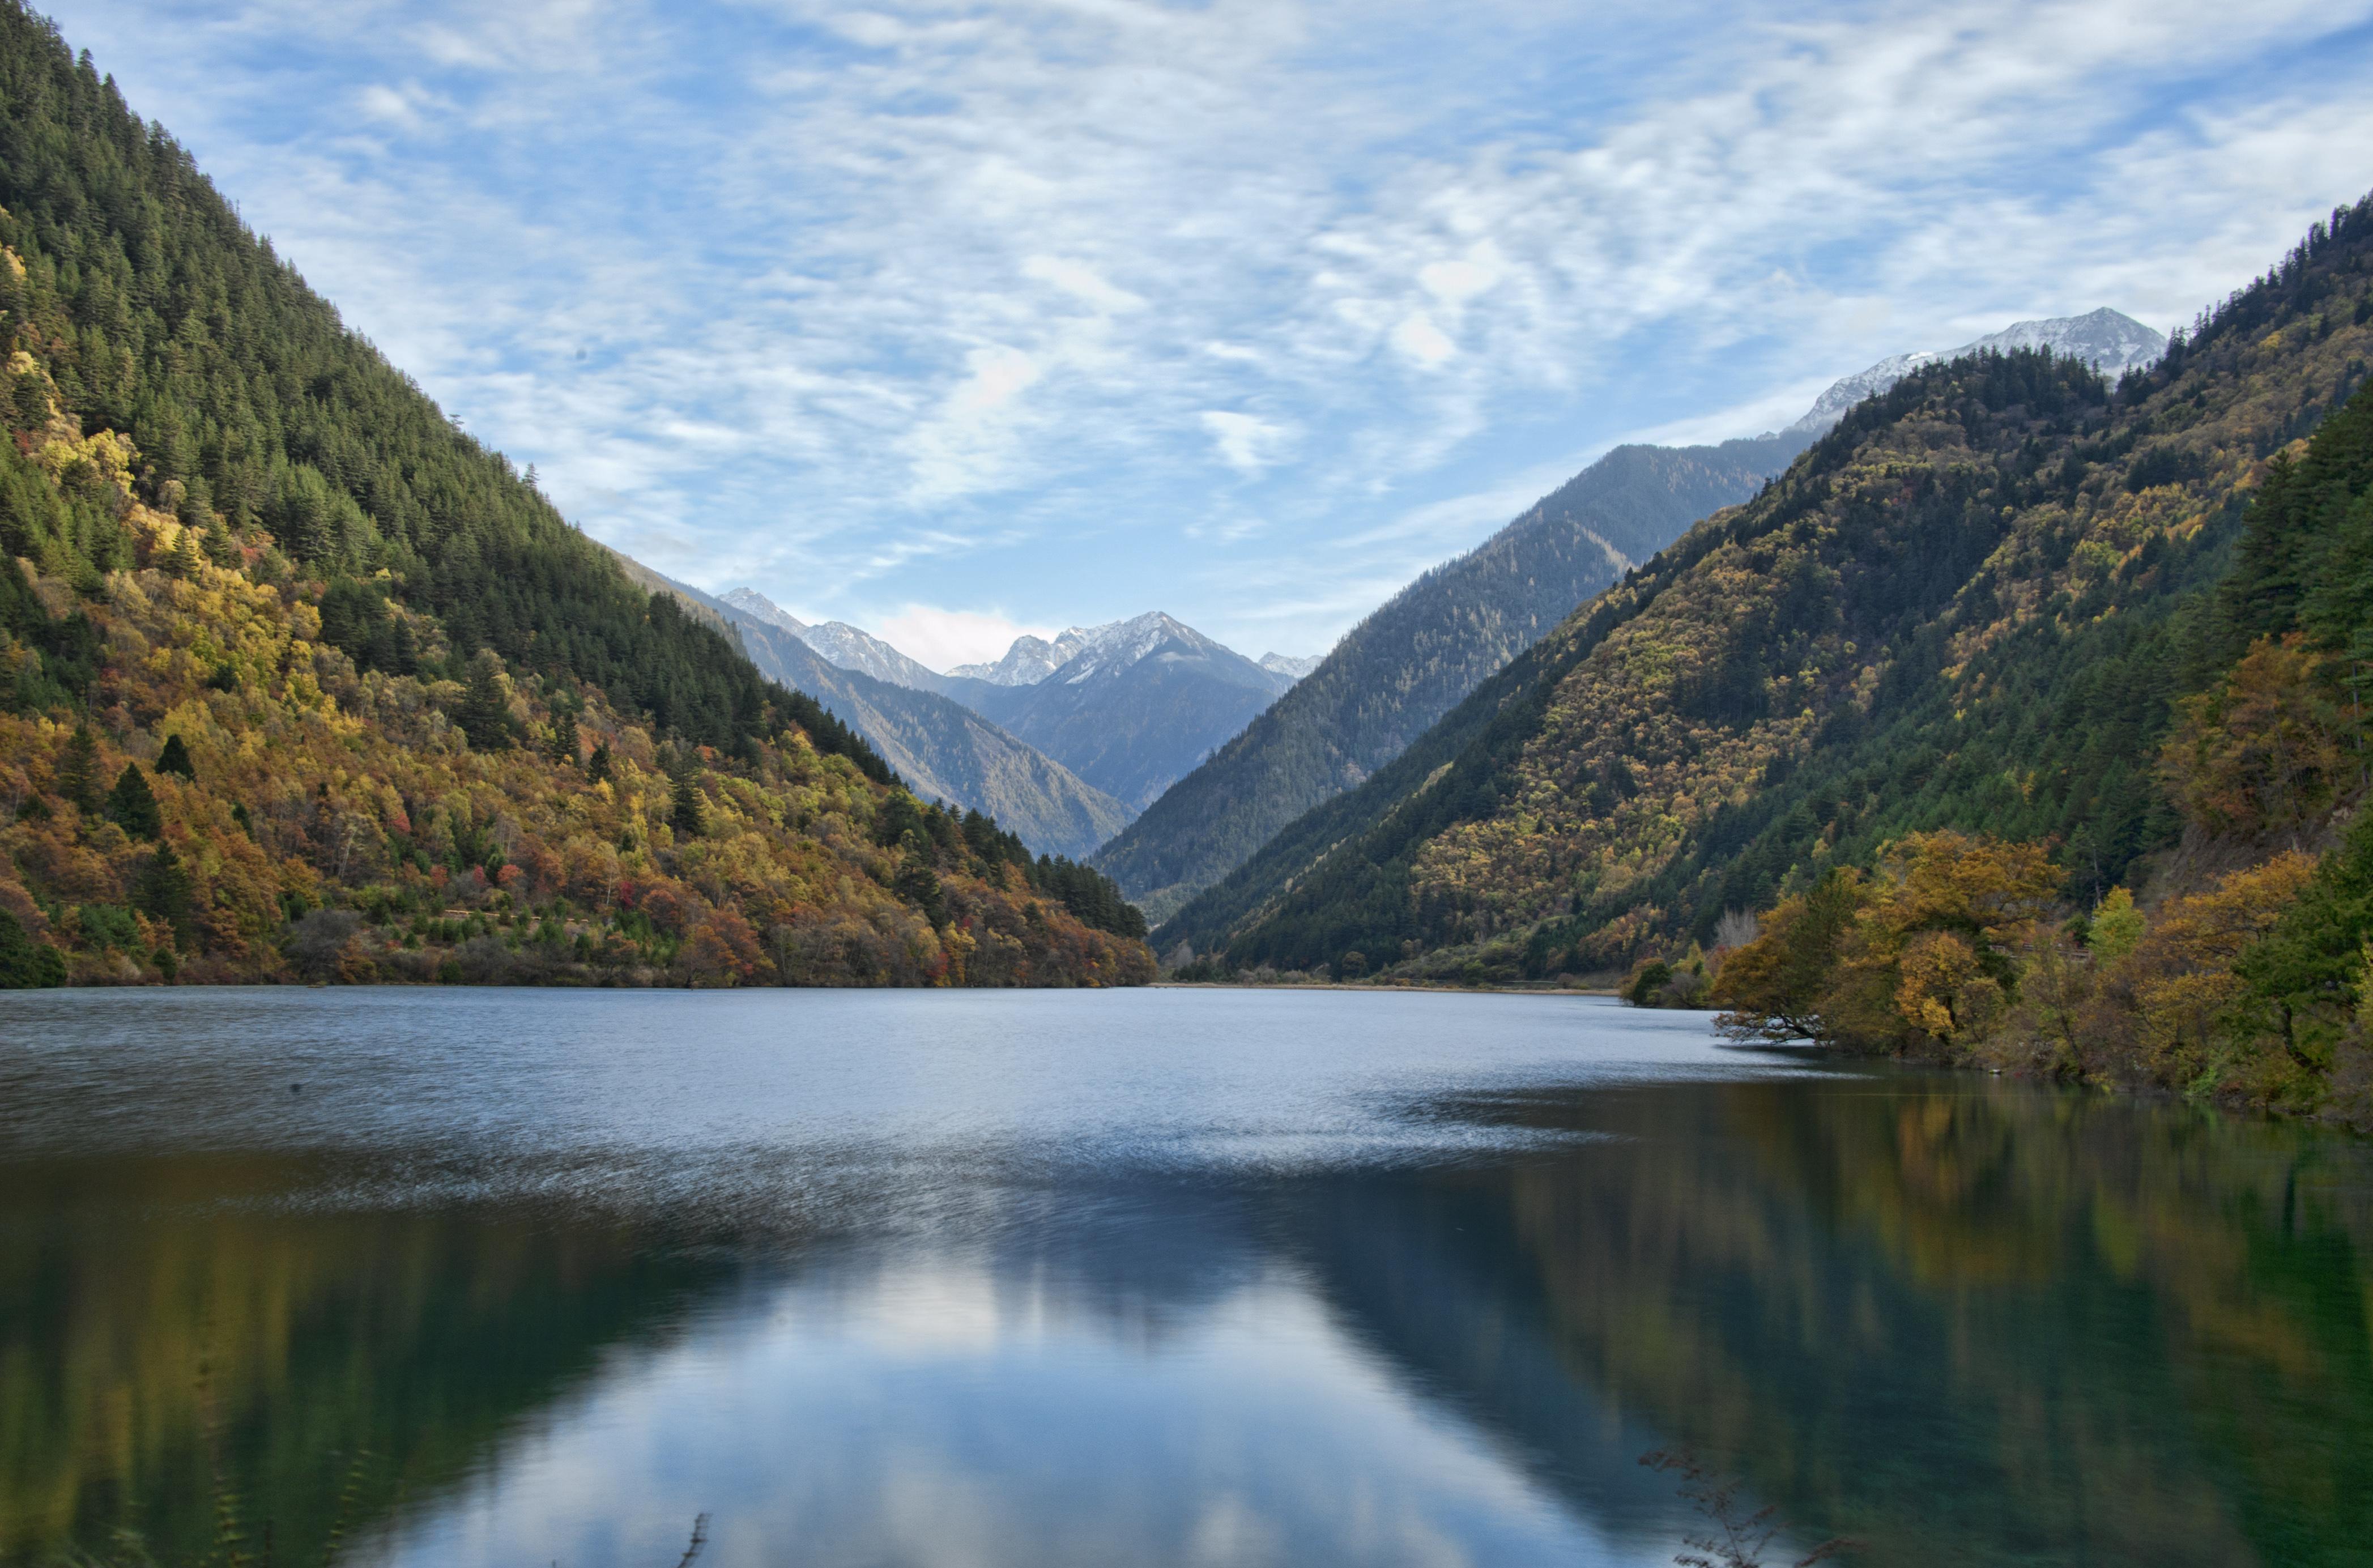 File:1 jiuzhaigou valley rhino lake 2011.jpg - Wikimedia Commons